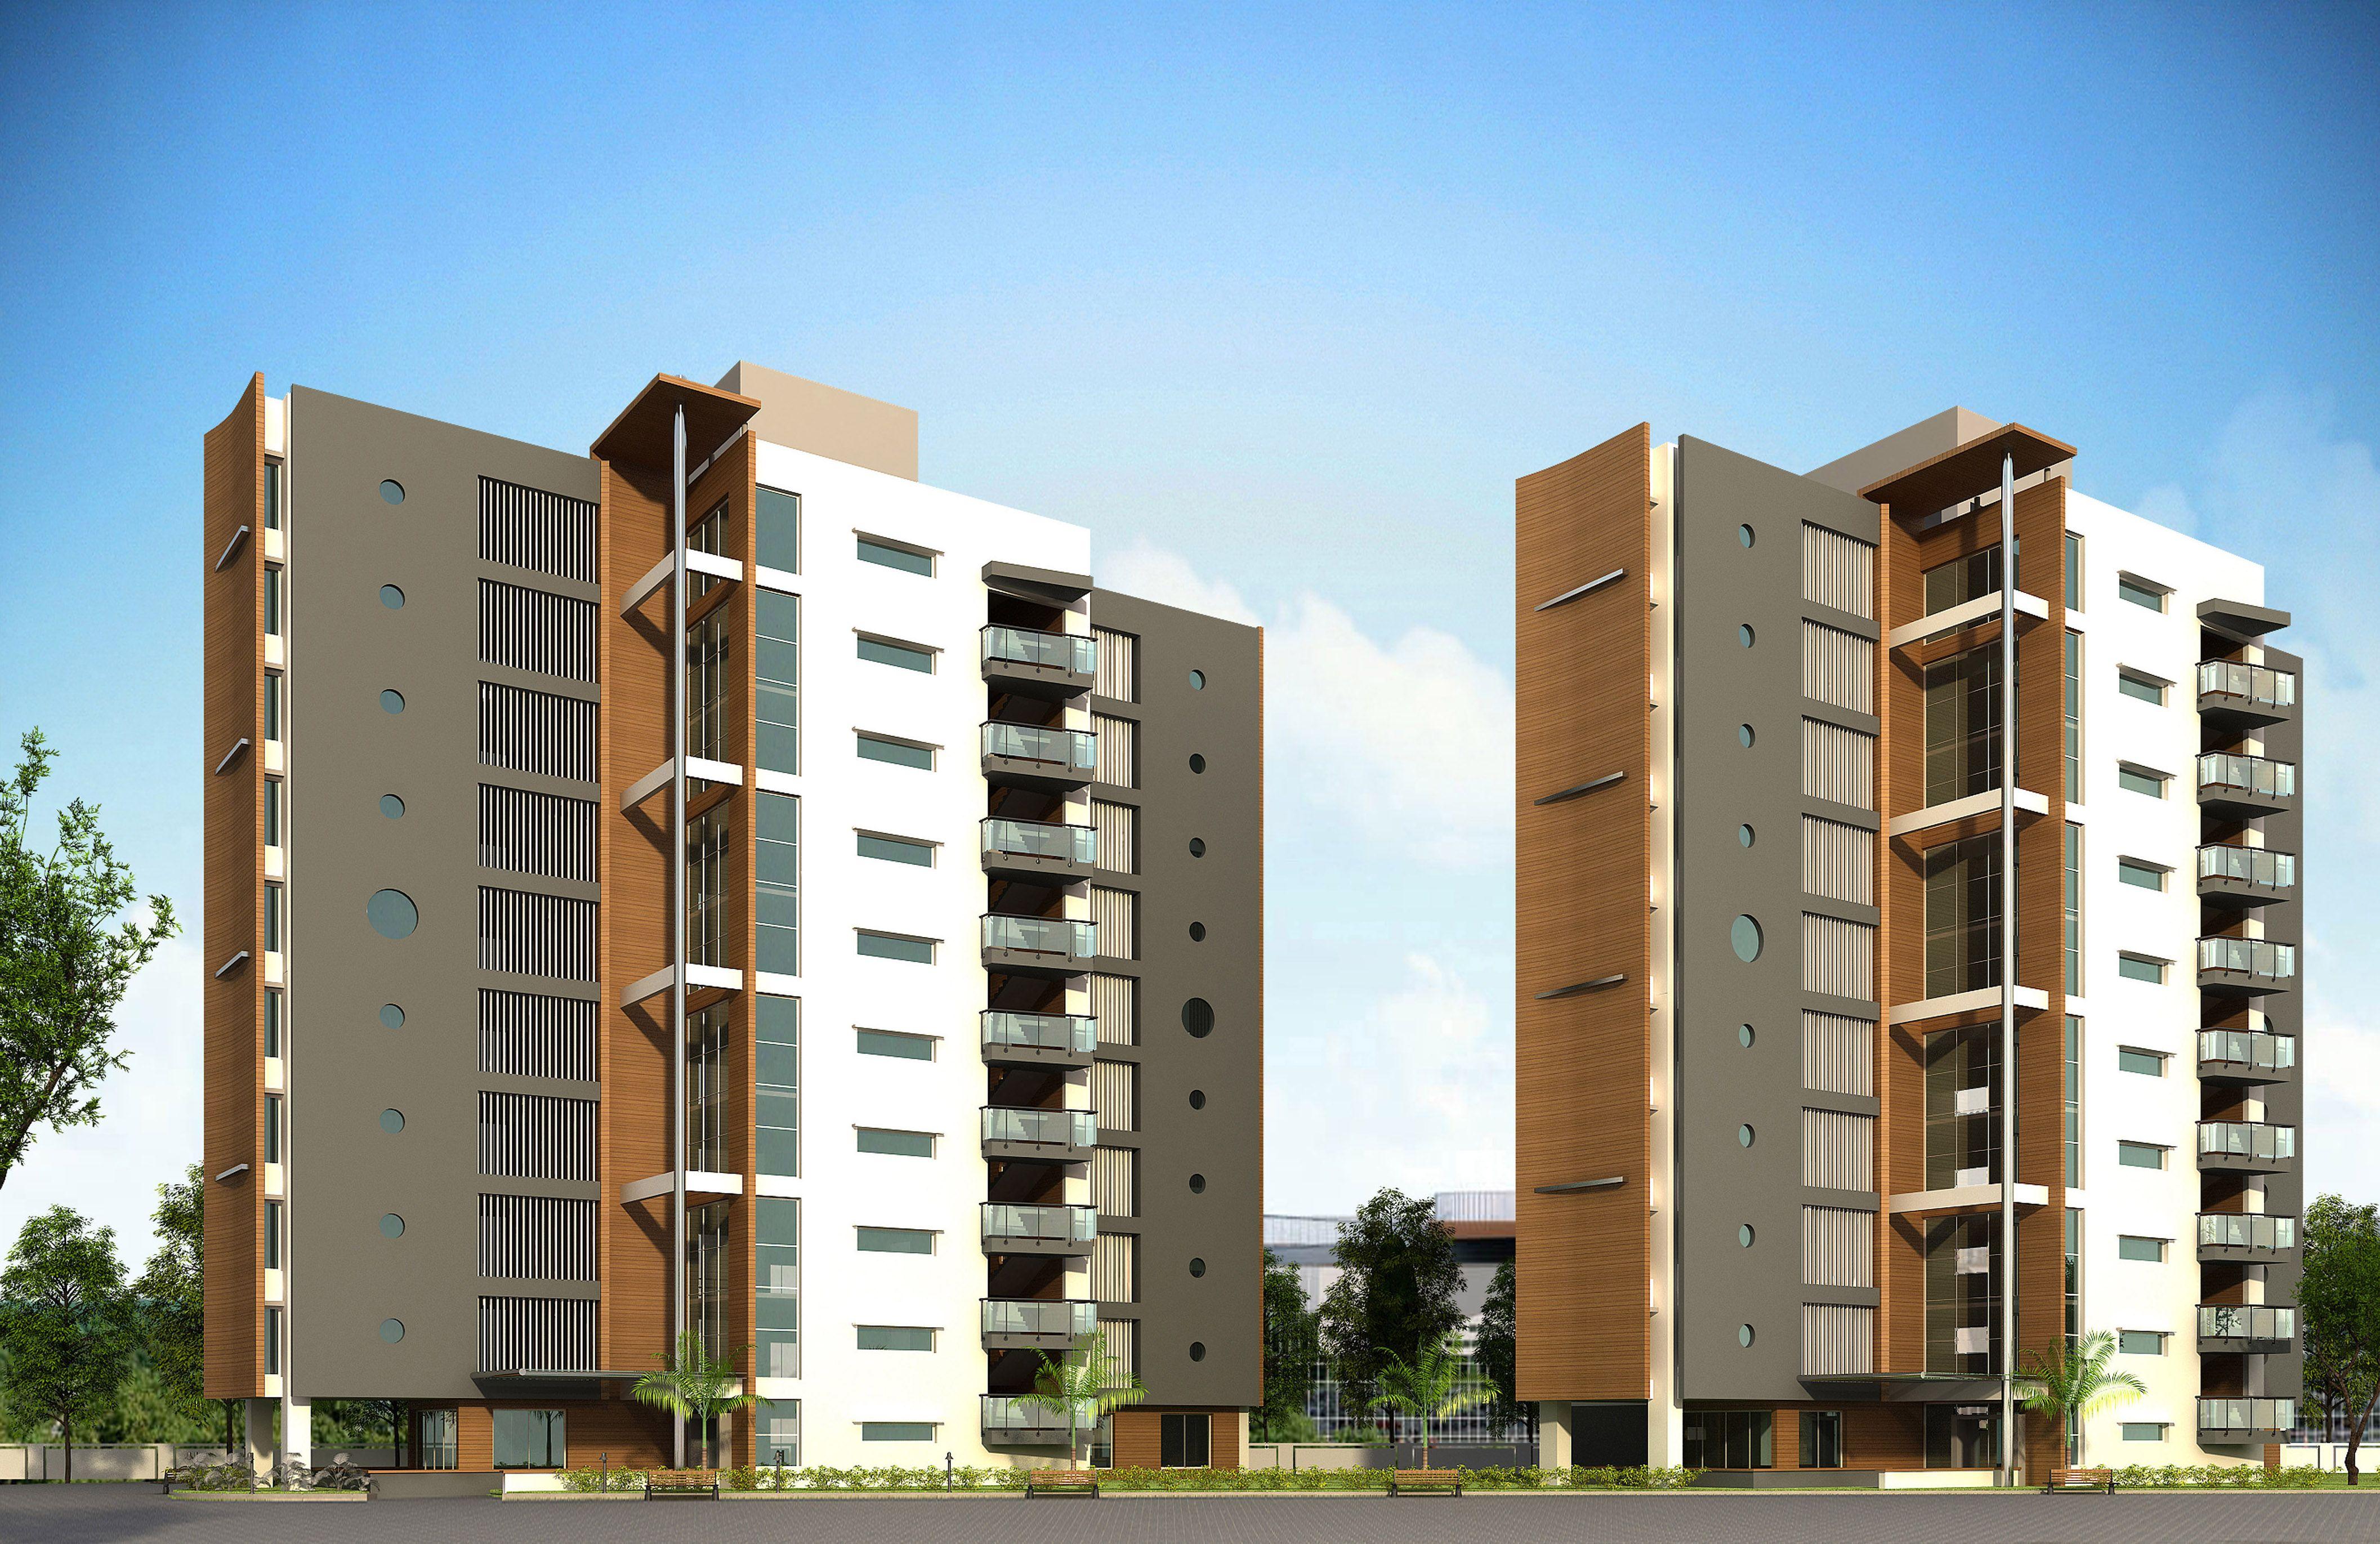 Dormitories Design Architecture Exterior Apartment High Rise Mva Maulikvyasarchitects